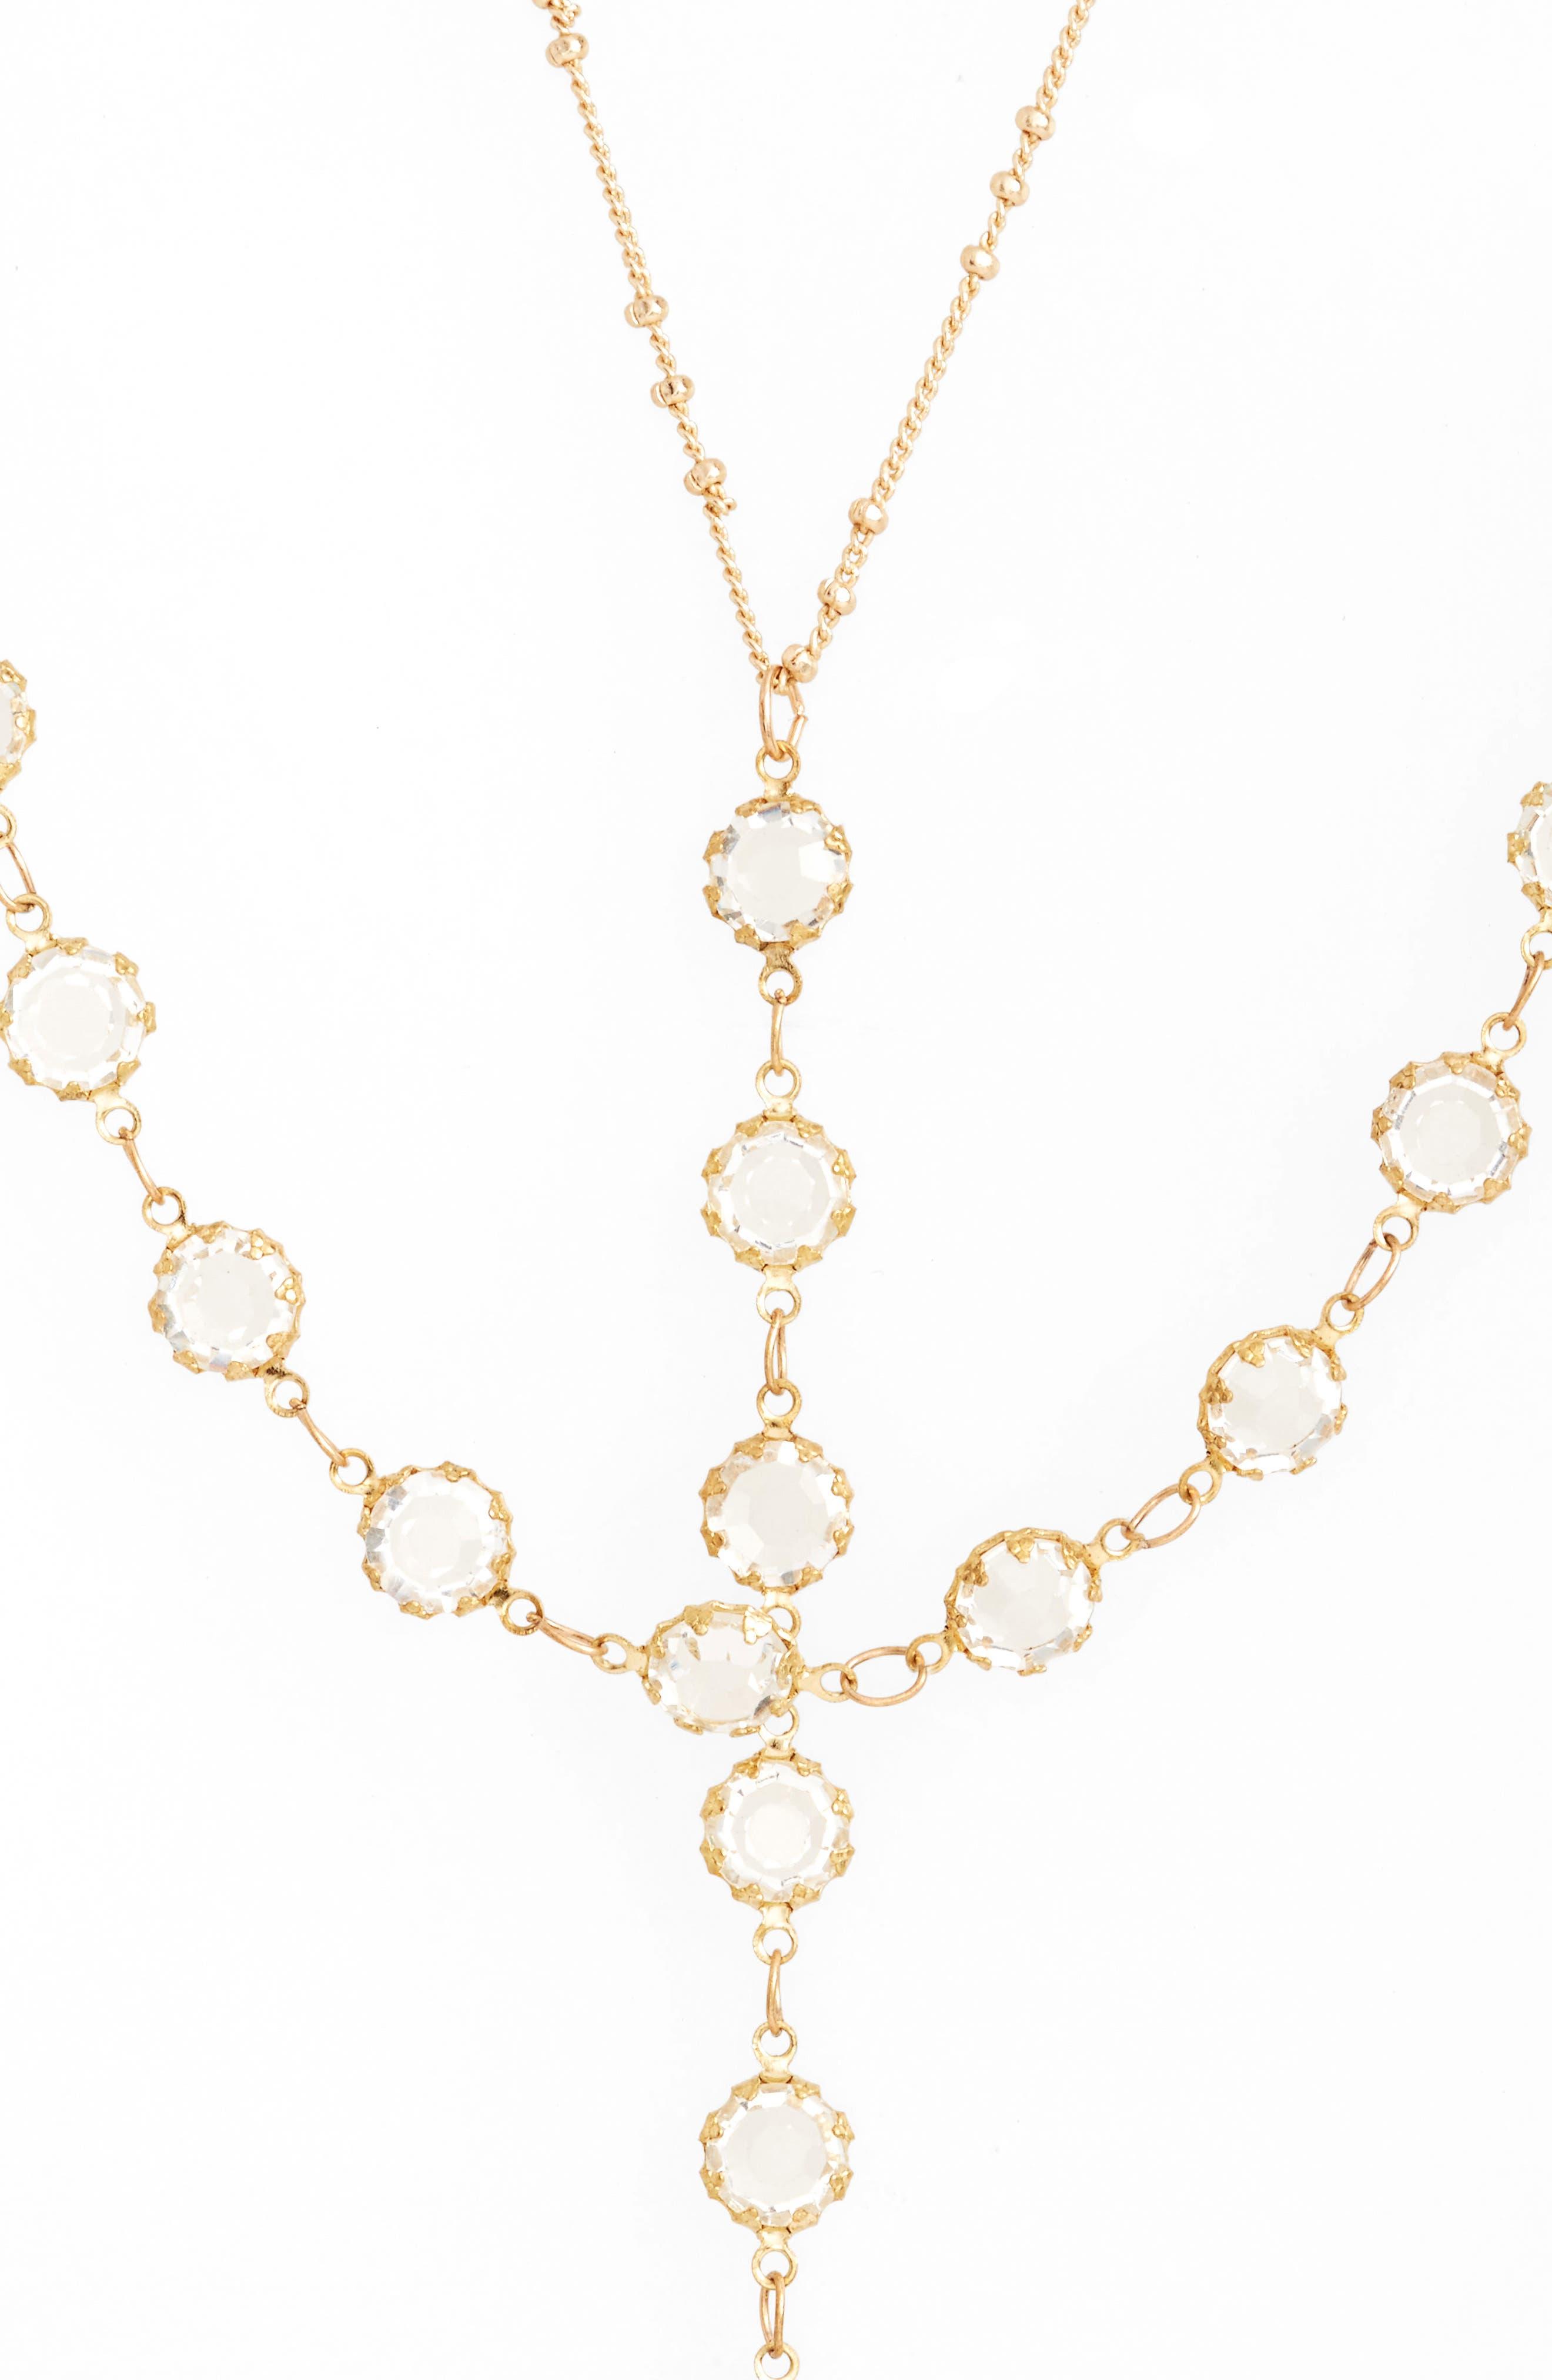 Vintage Crystal Y-Necklace,                             Main thumbnail 1, color,                             710